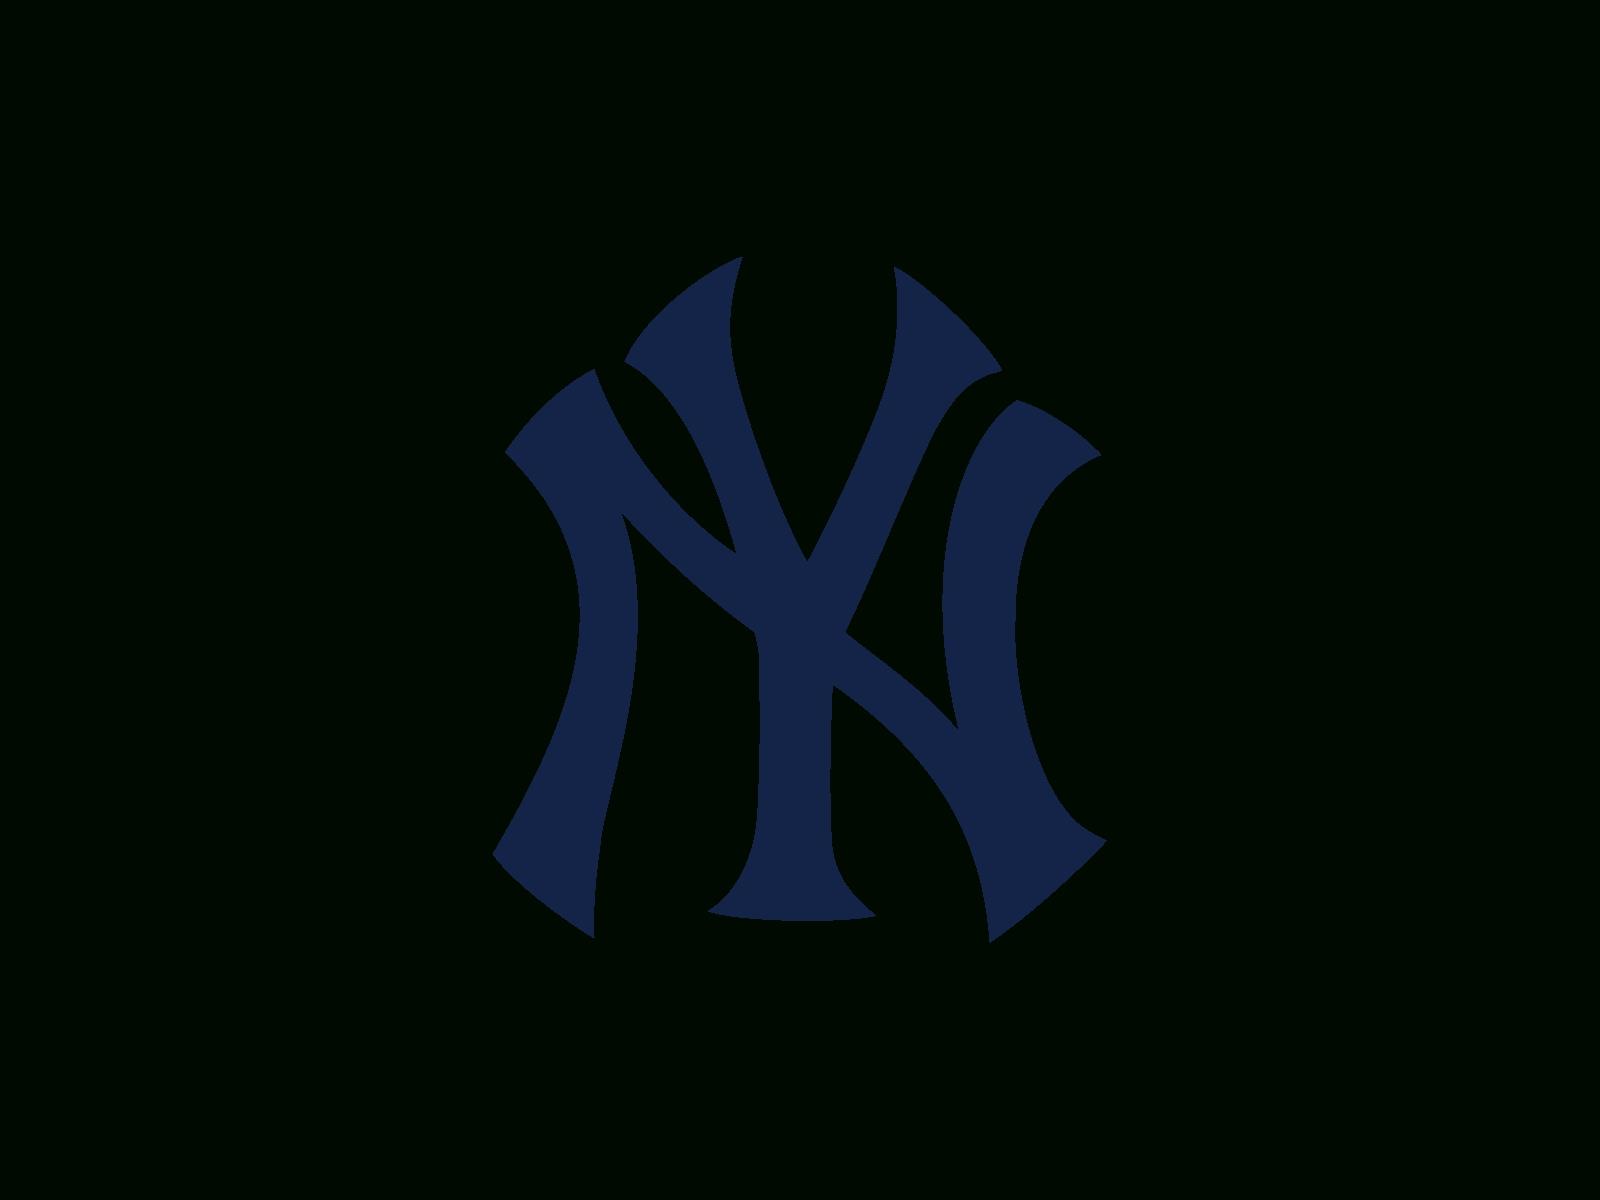 new york yankees logo | logok